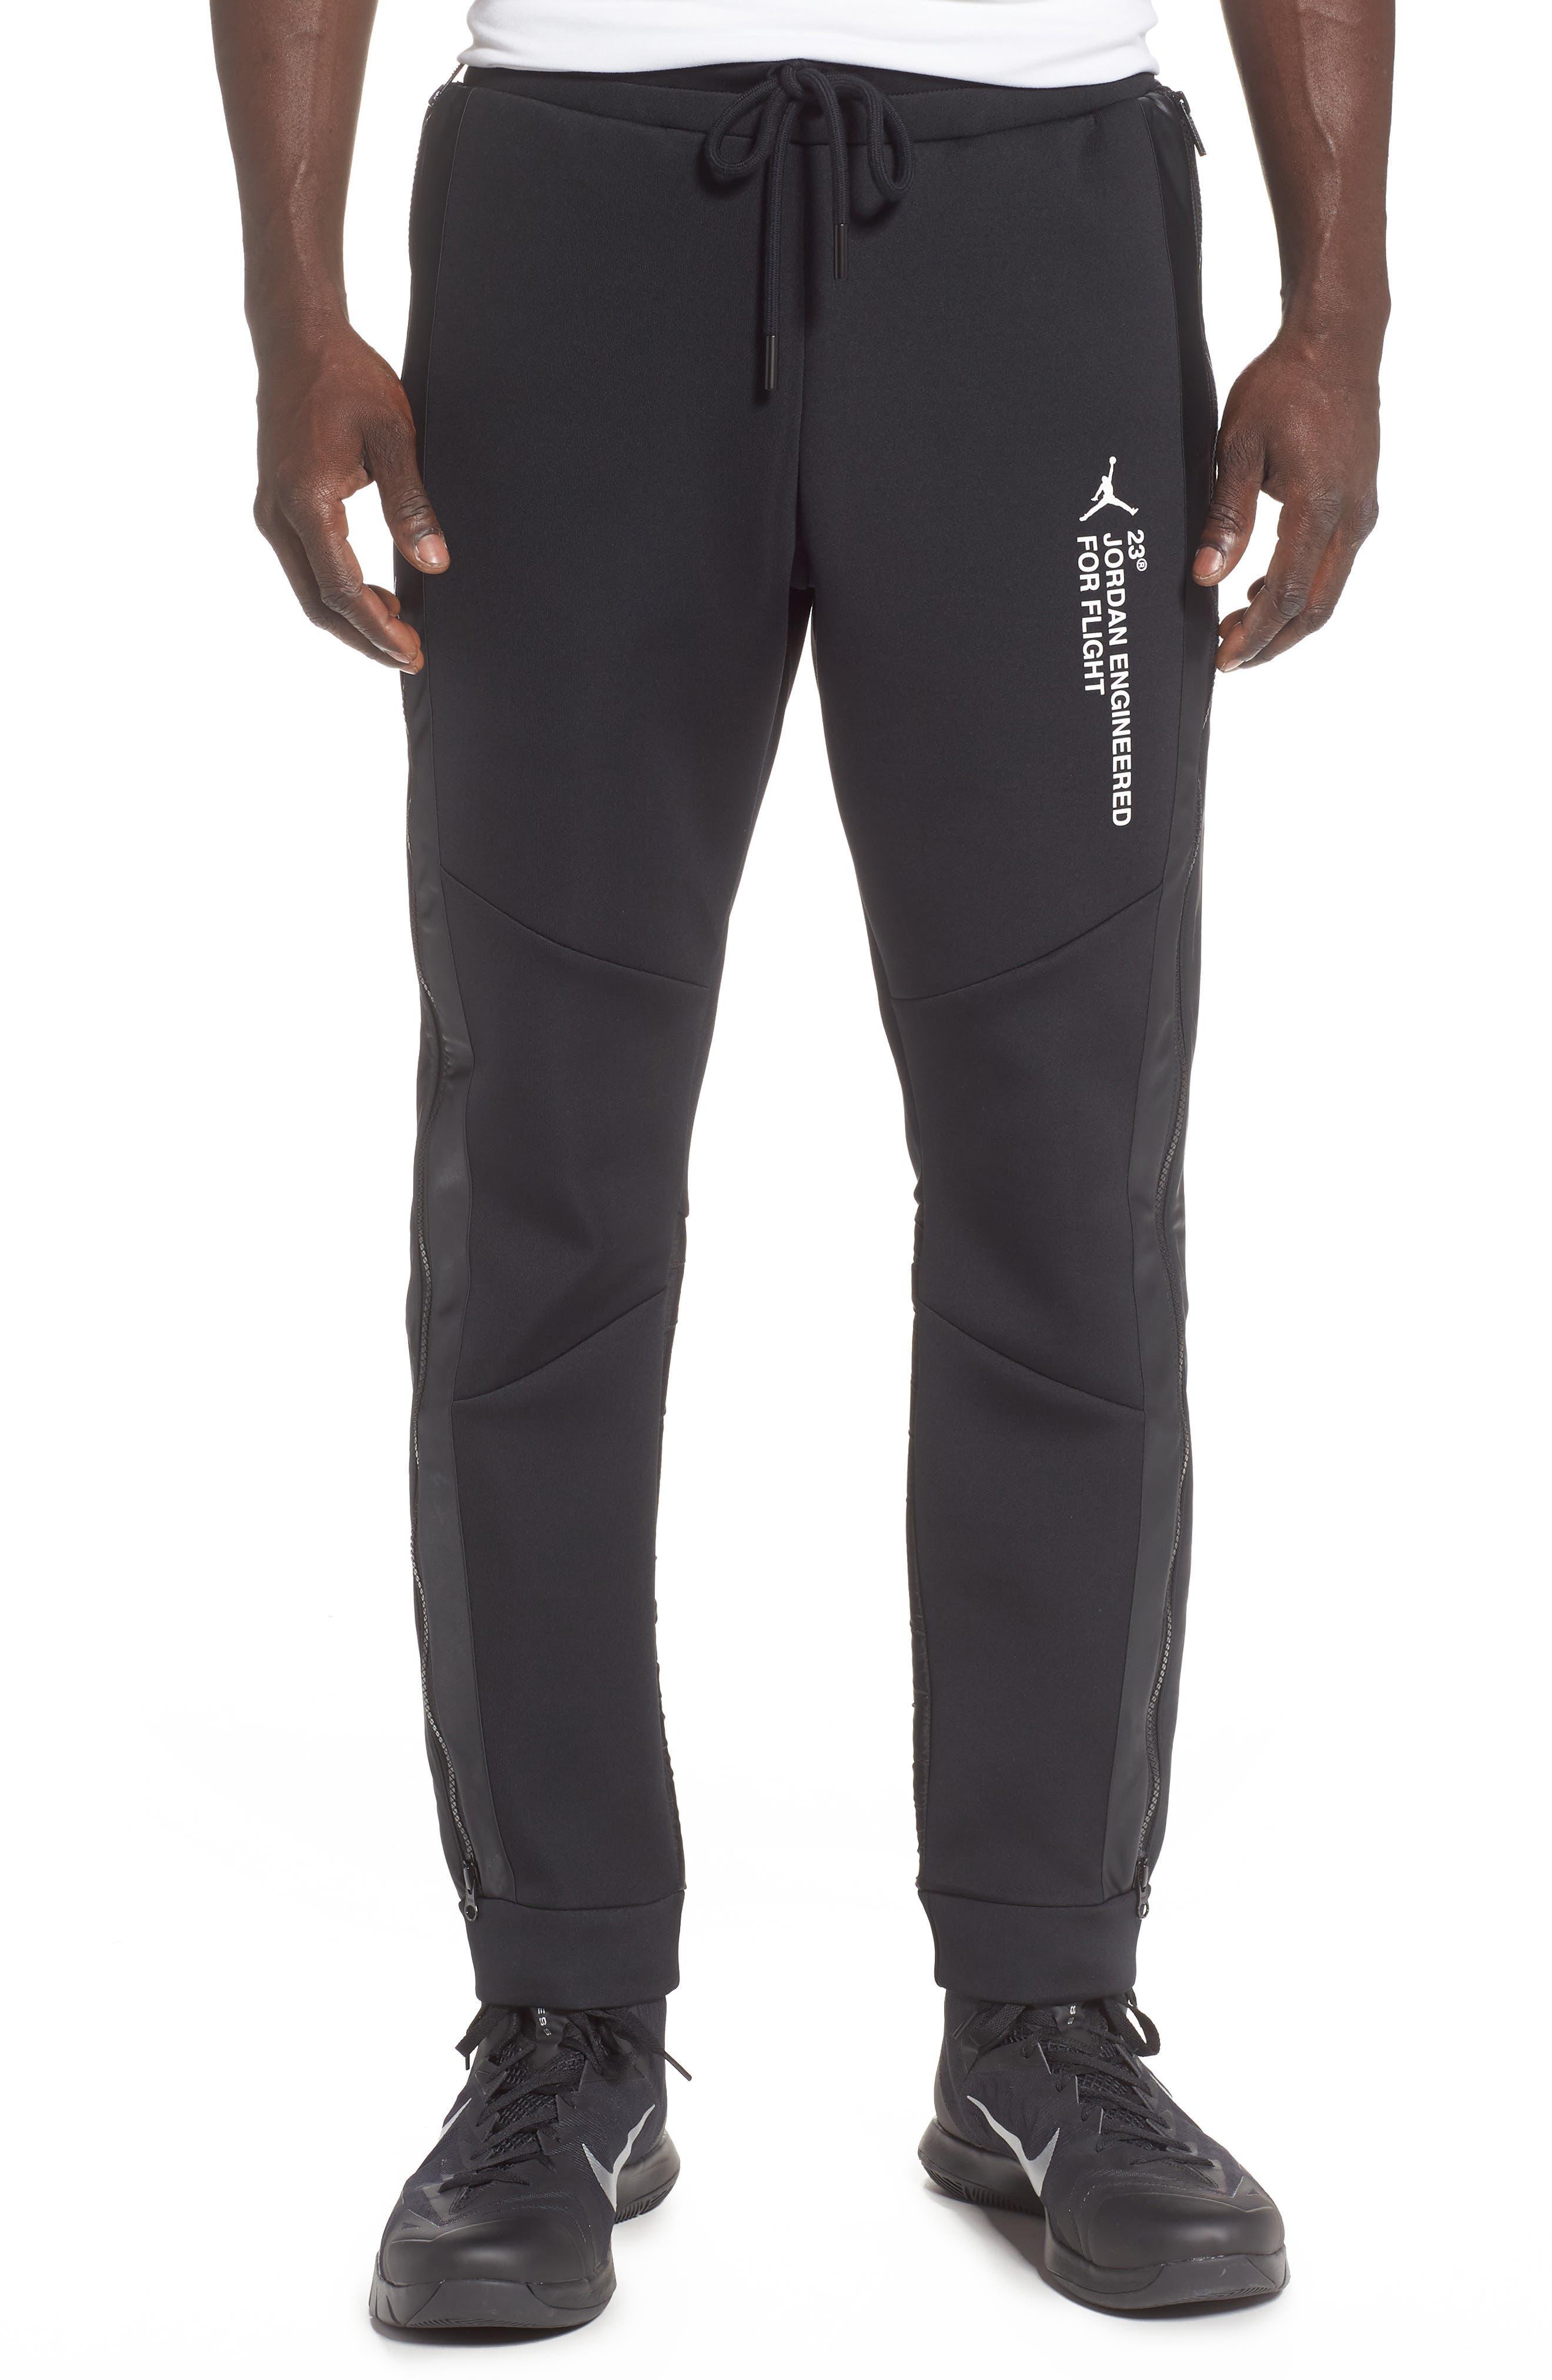 Jordan 23 Engineered Sweatpants, Black